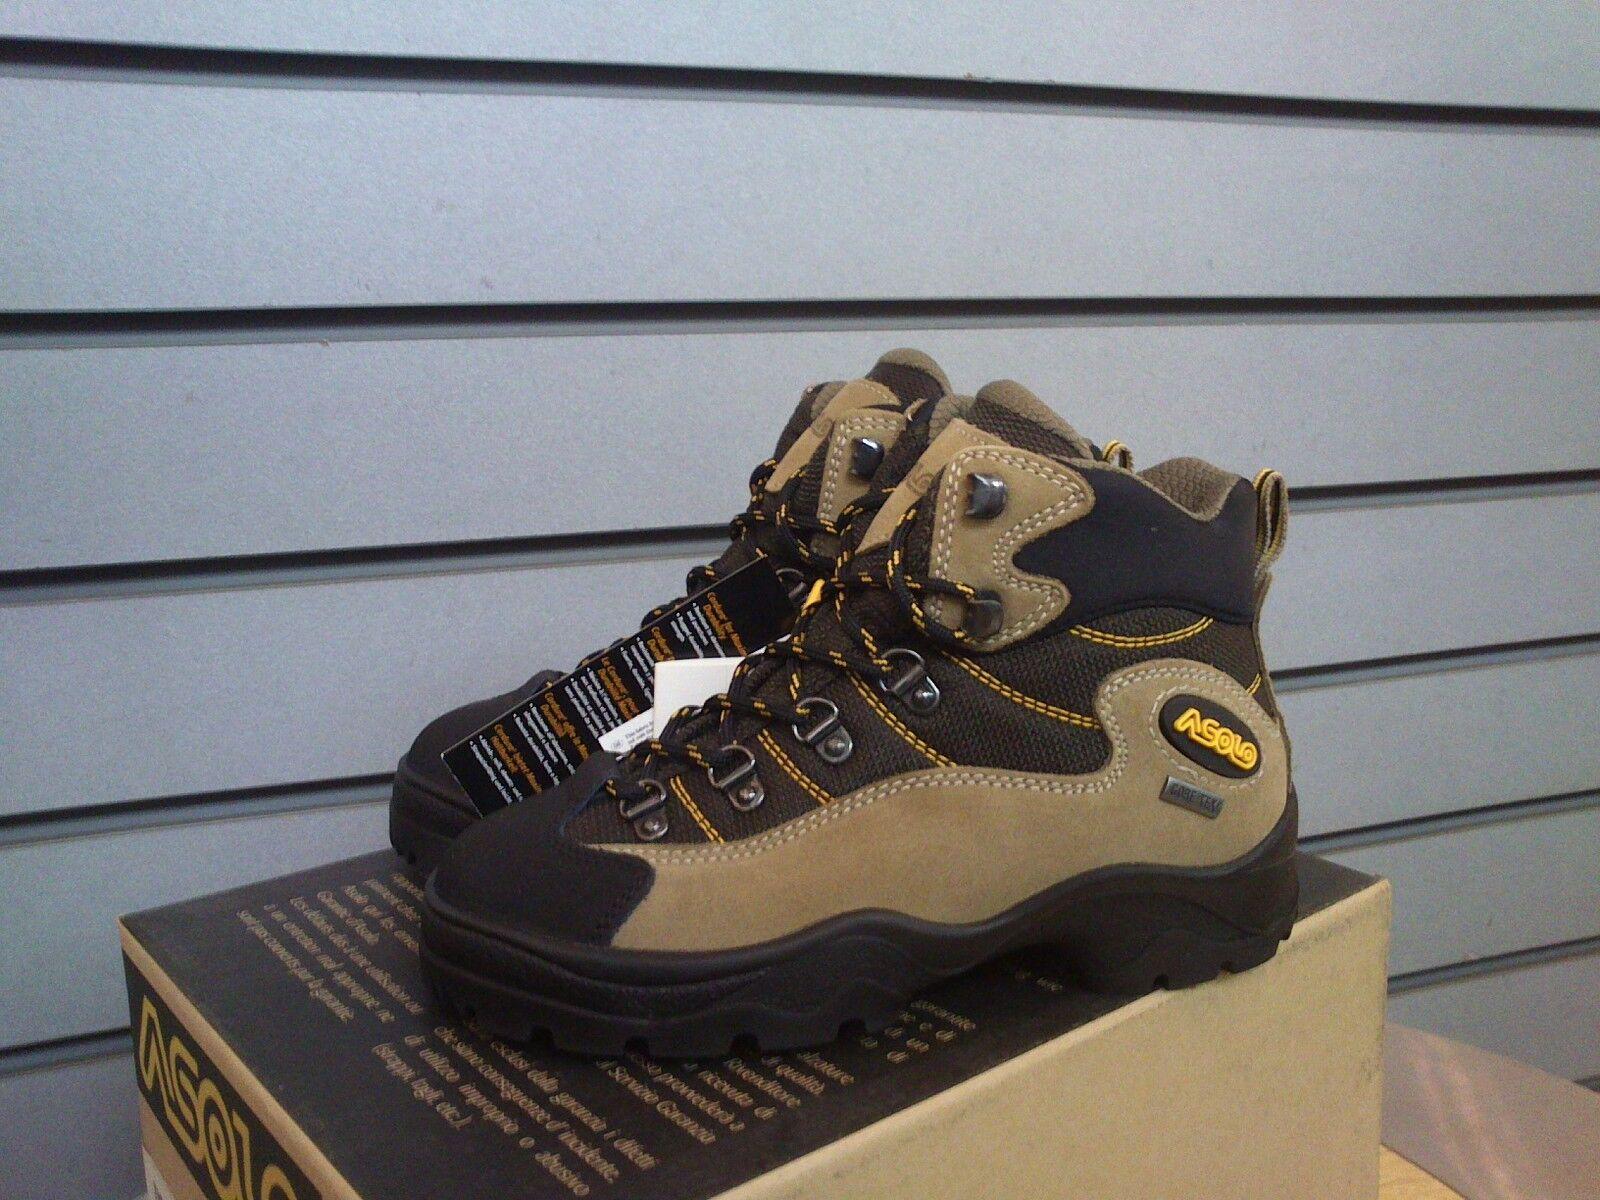 SHOES shoes TREKKING HIKING JUNIOR ASOLO TIGER GTX GORETEX 0M5283 501 ALPACA BR